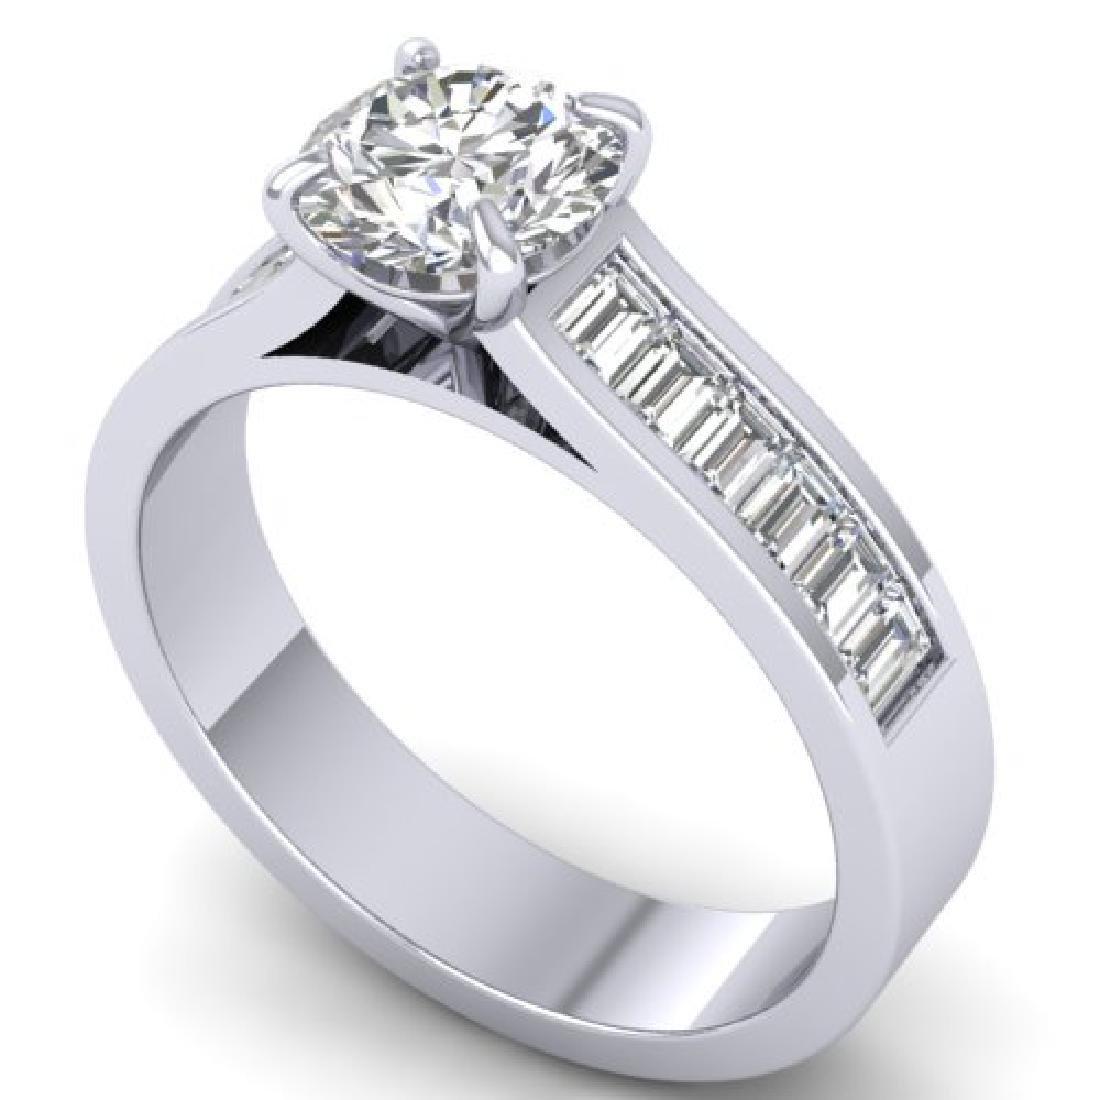 1.75 CTW Certified VS/SI Diamond Solitaire Art Deco